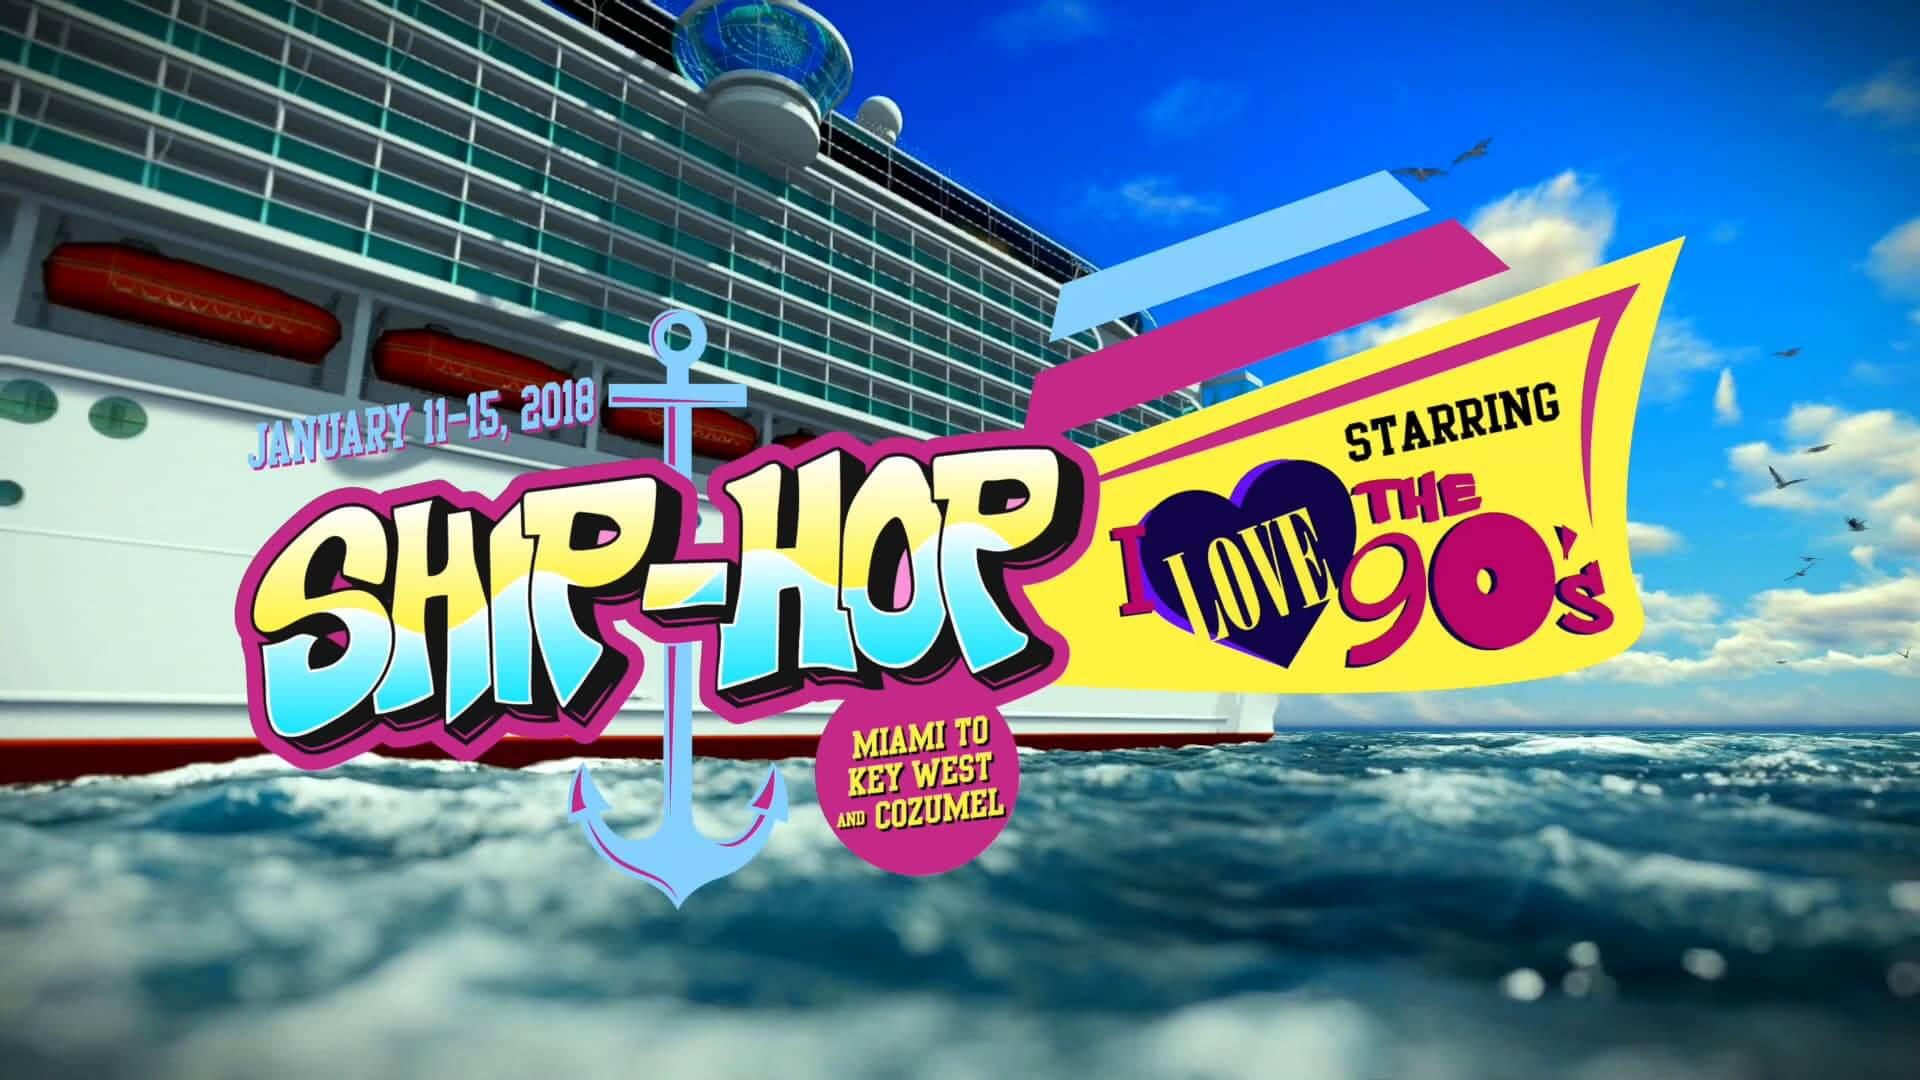 Ship Hop 2018